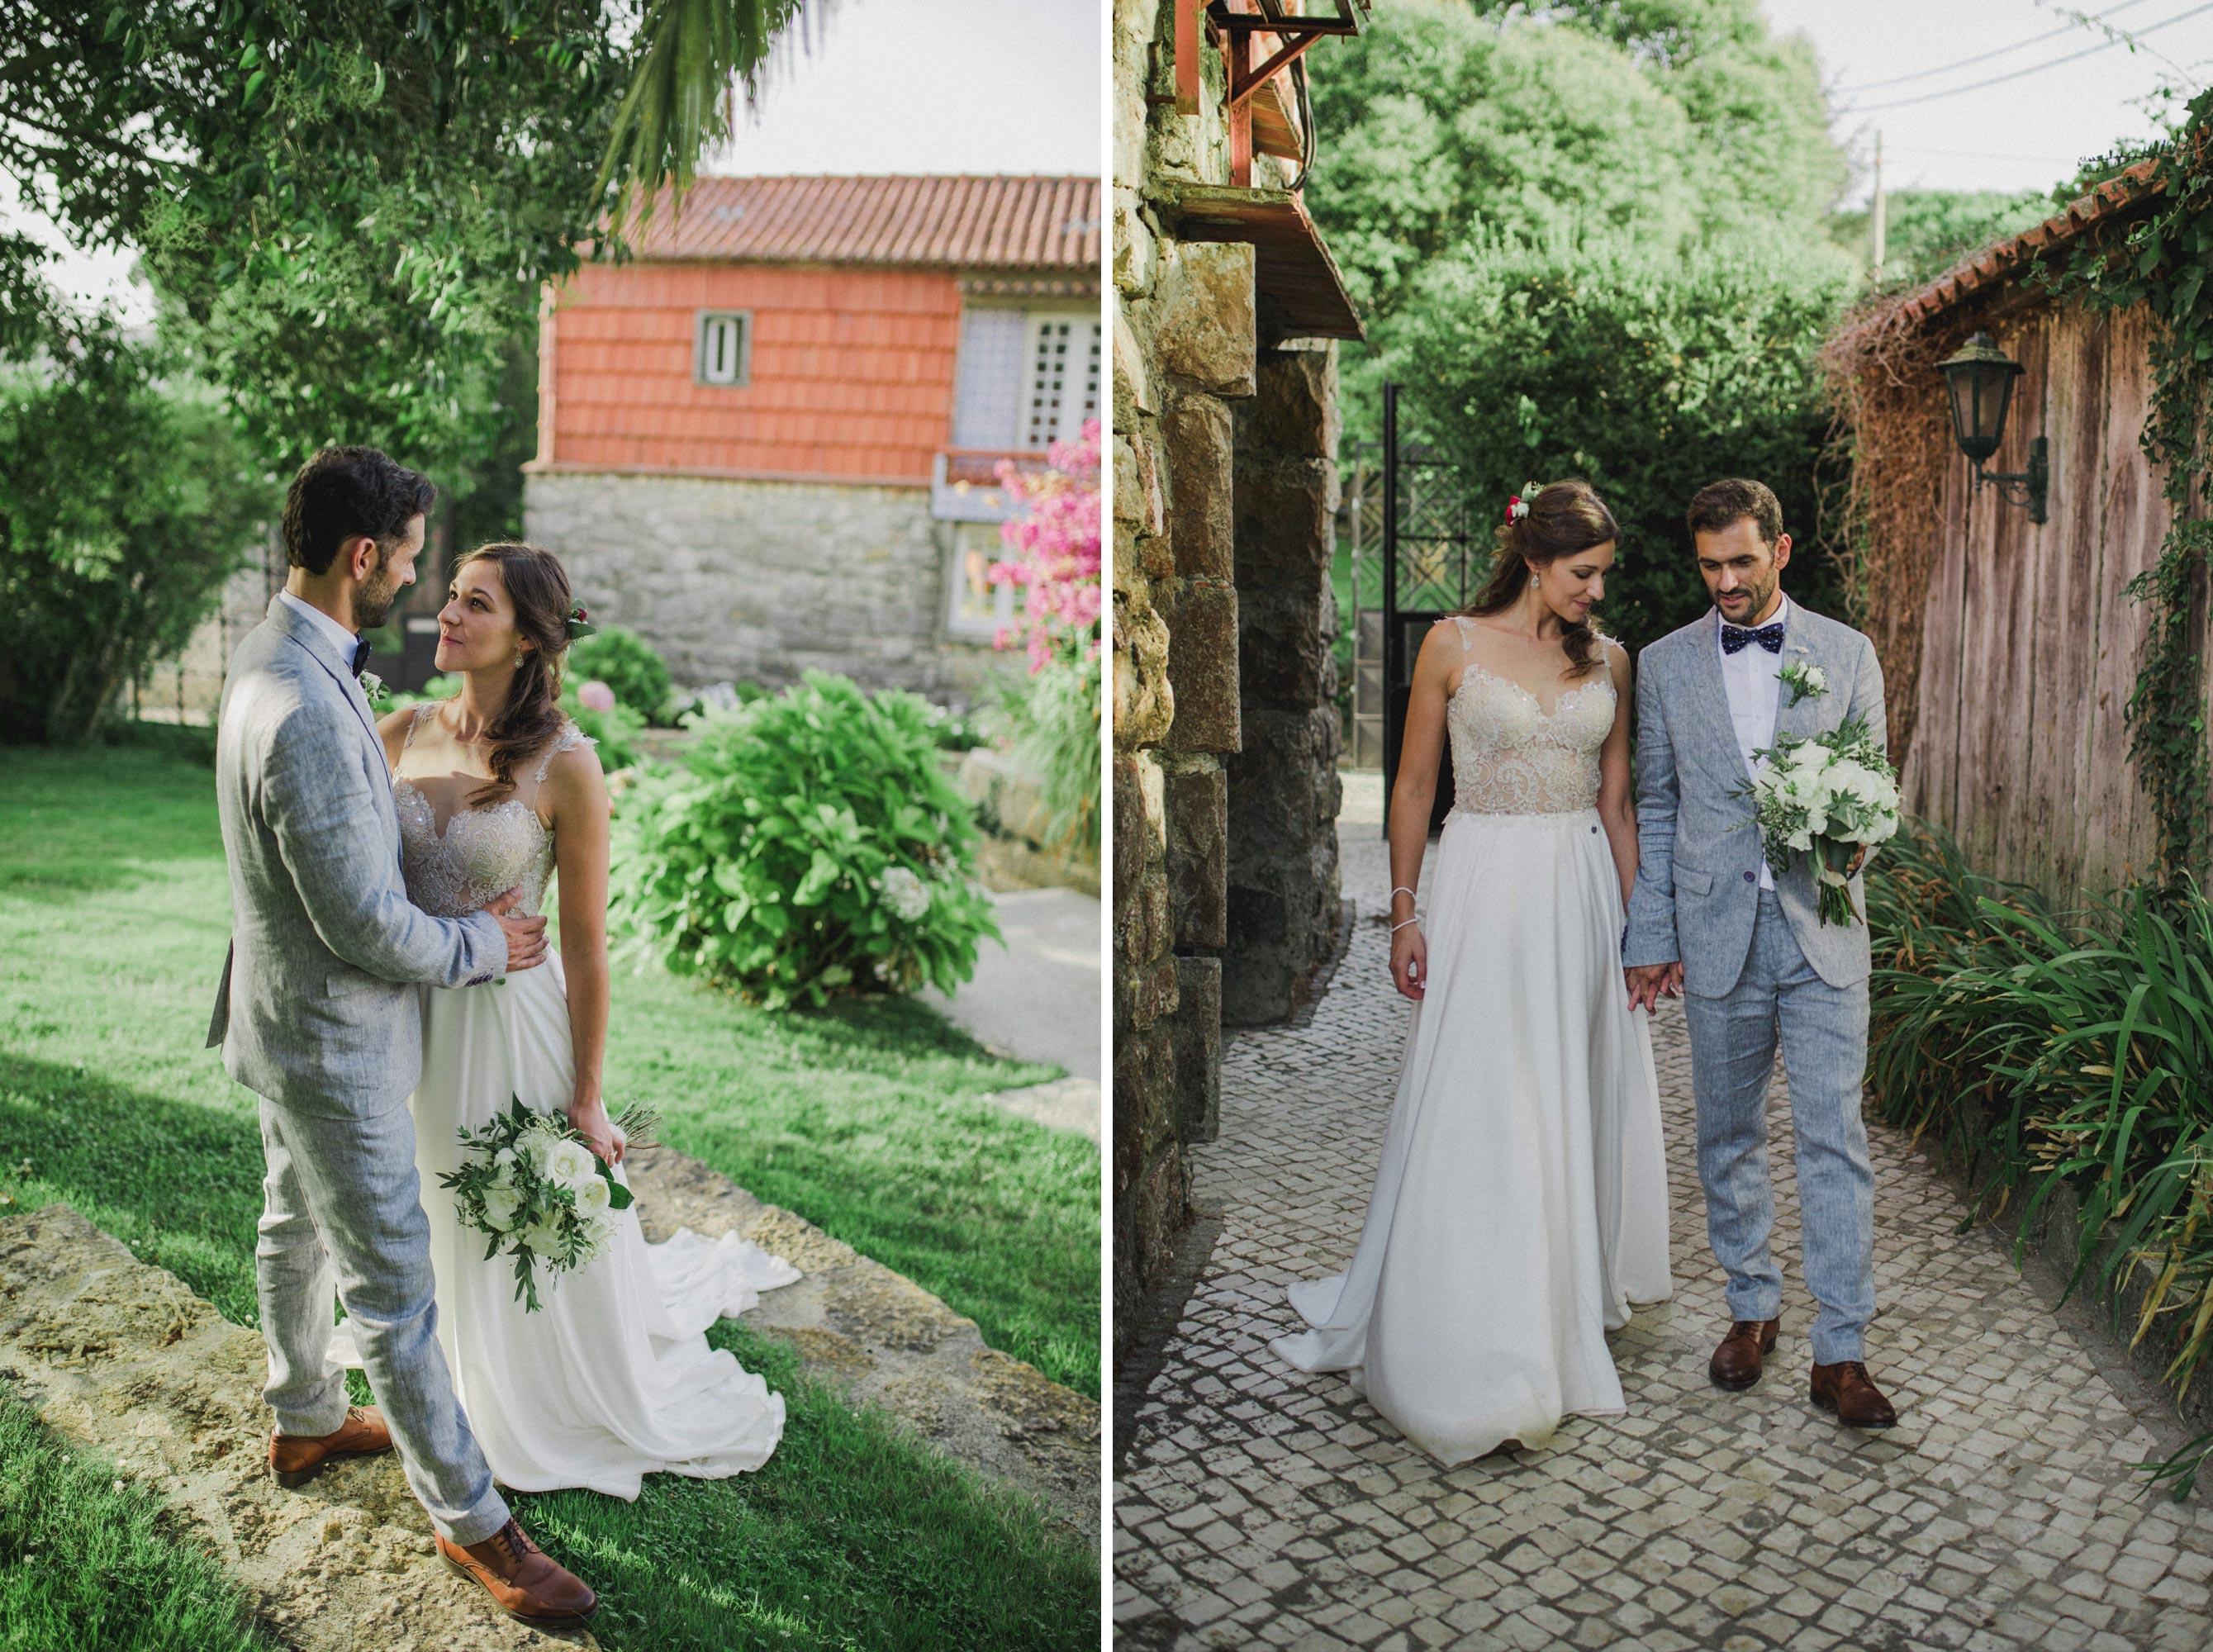 025-carina-e-samuel-wedding-casamento-quinta-dos-rouxinois-rustico-my-fancy-wedding-mafra-malveira-lisboa-sintra-cascais-filipe-santiago-fotografia-fotografo-lifestyle-destination-portugal